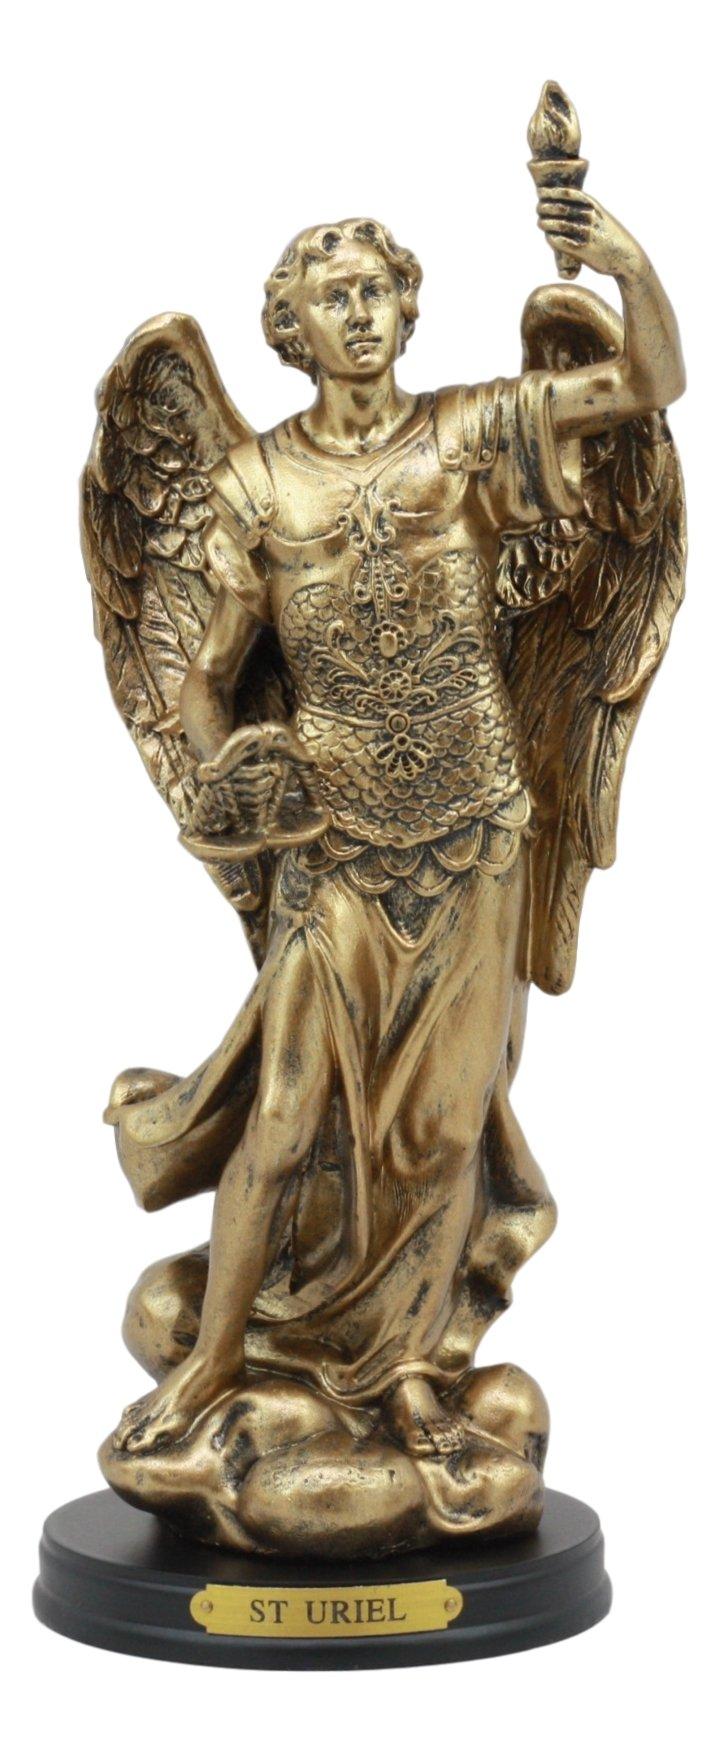 Ebros Catholic Church Archangel Uriel Statue 8'' Tall Saint Uriel The Archangel Figurine With Brass Name Plate Wooden Base